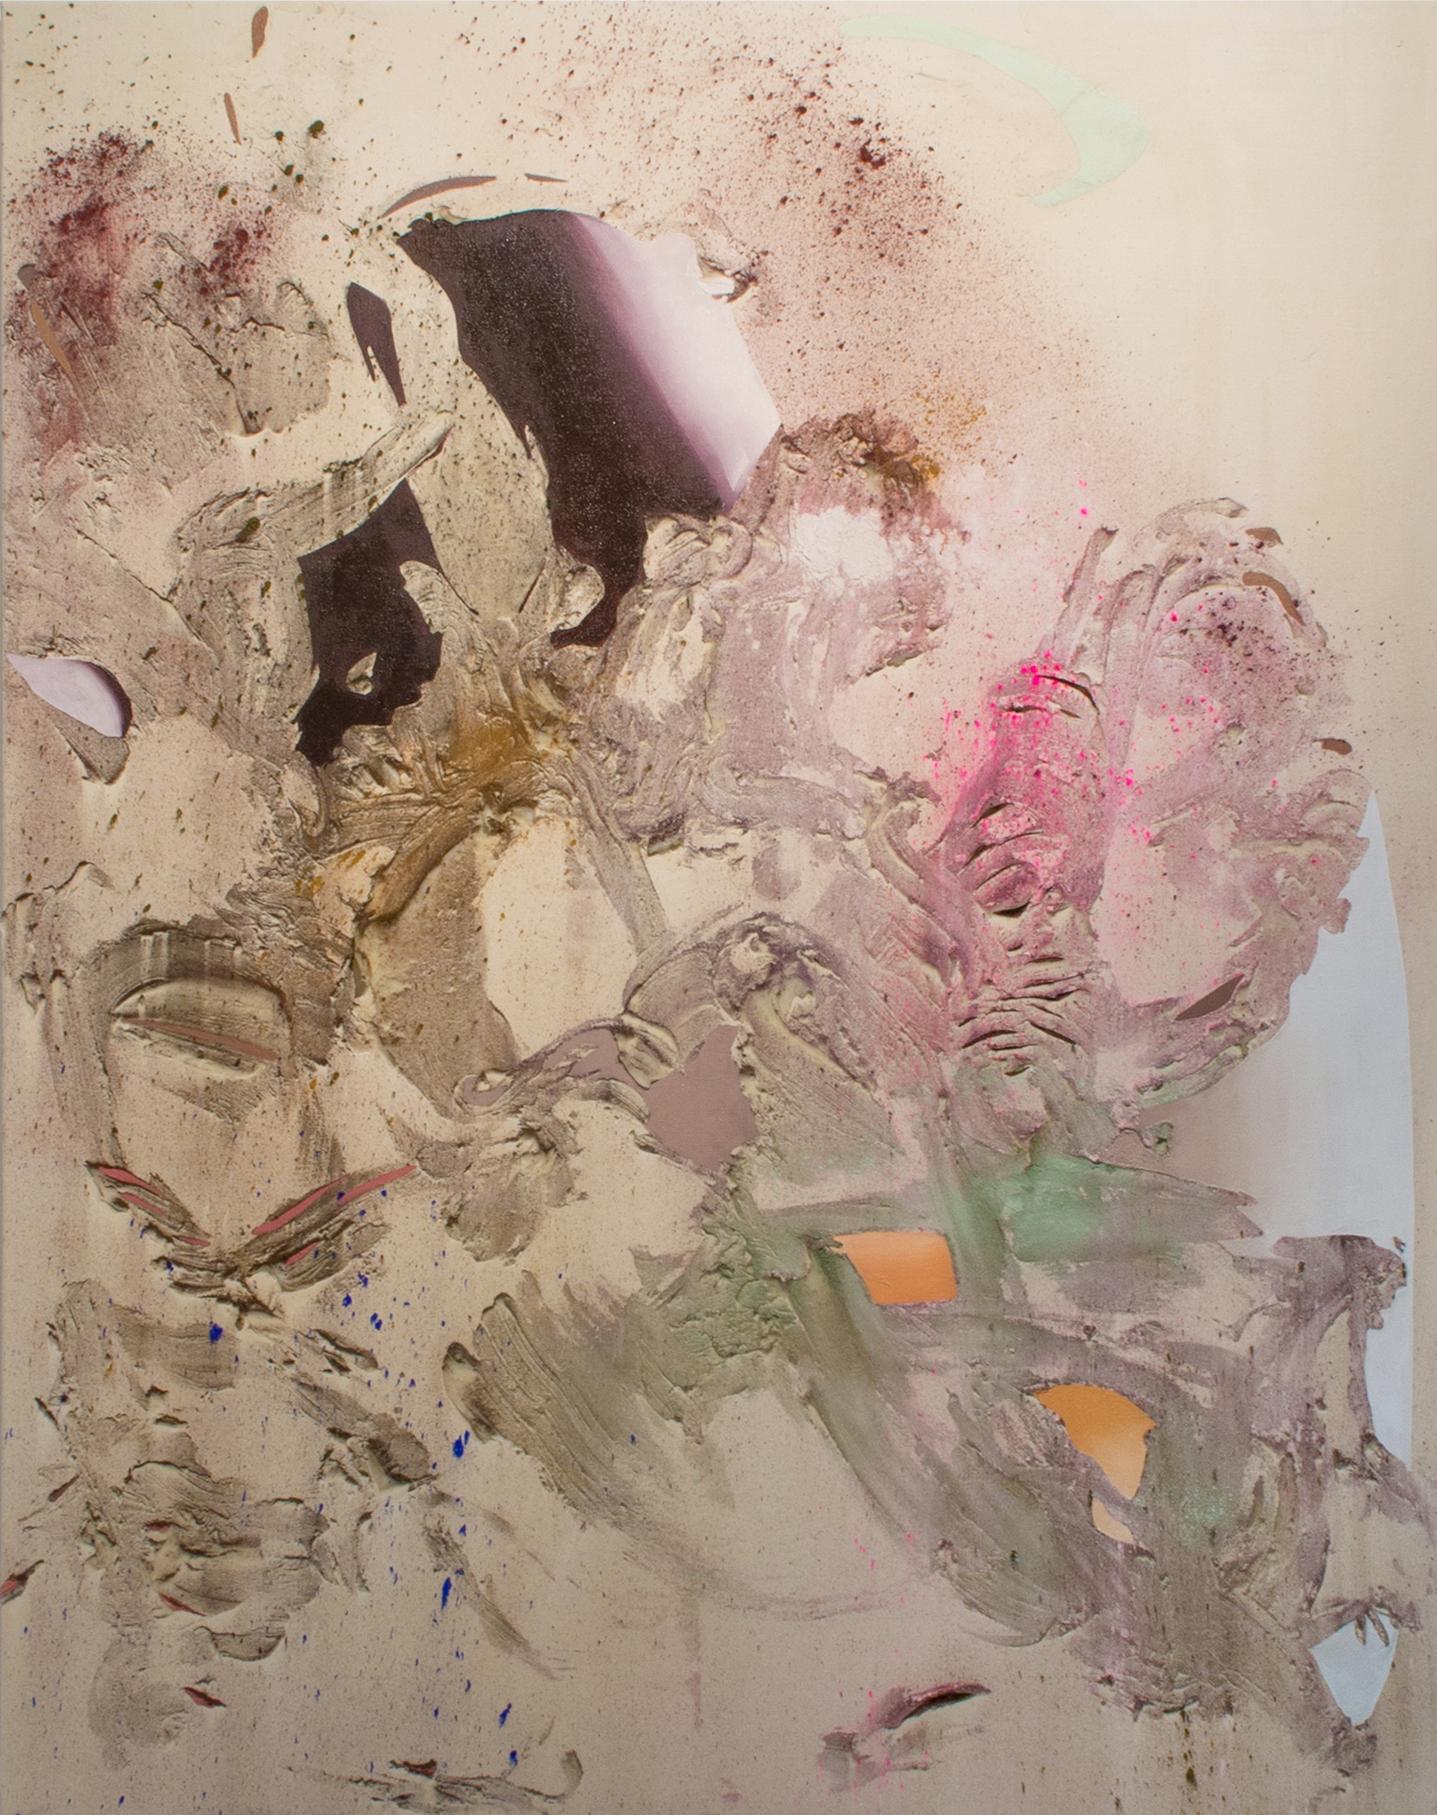 Megacaldera 2, Cold Wax Medium, Raw Pigments, and Oil on Canvas, 5x4 feet, 2016